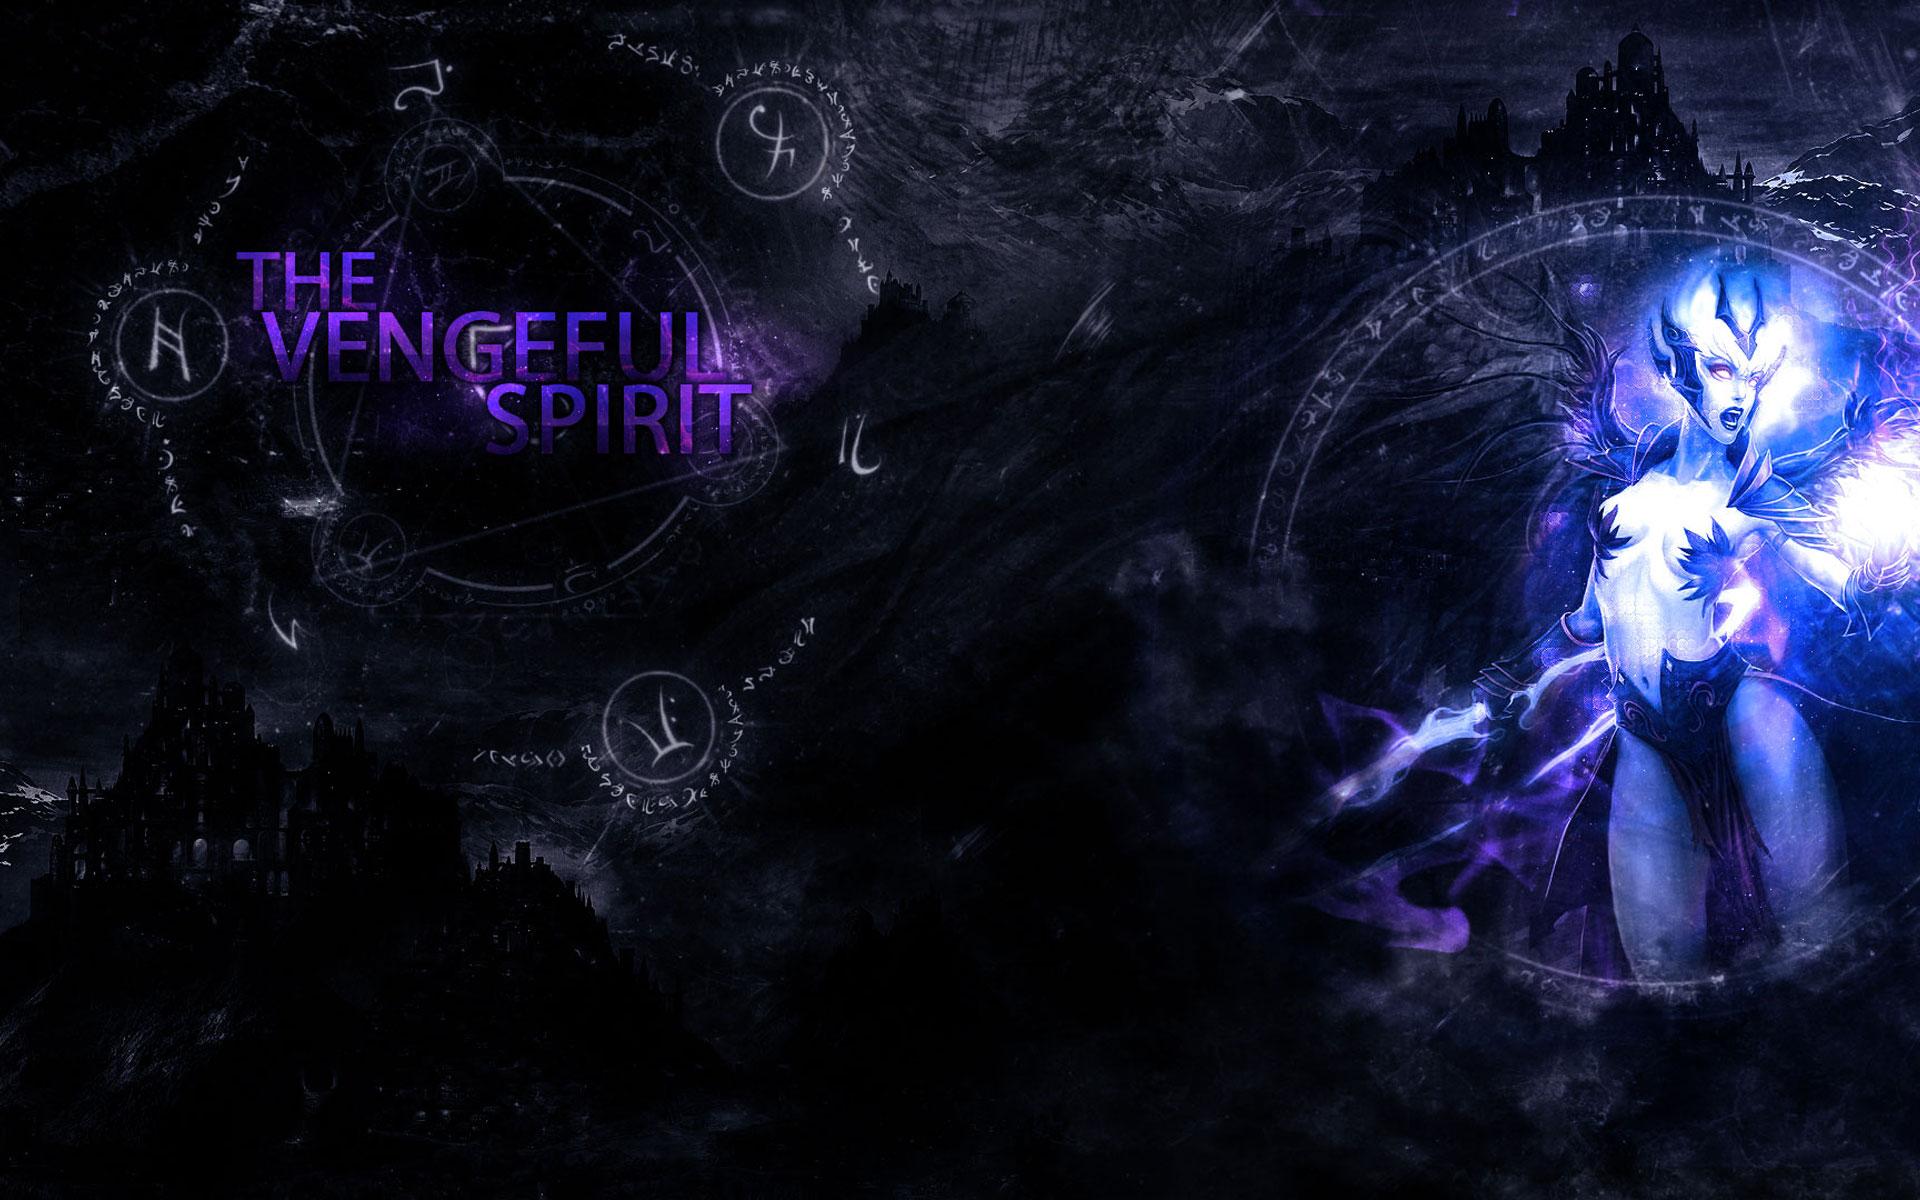 Dota2 : Vengeful Spirit full hd wallpapers